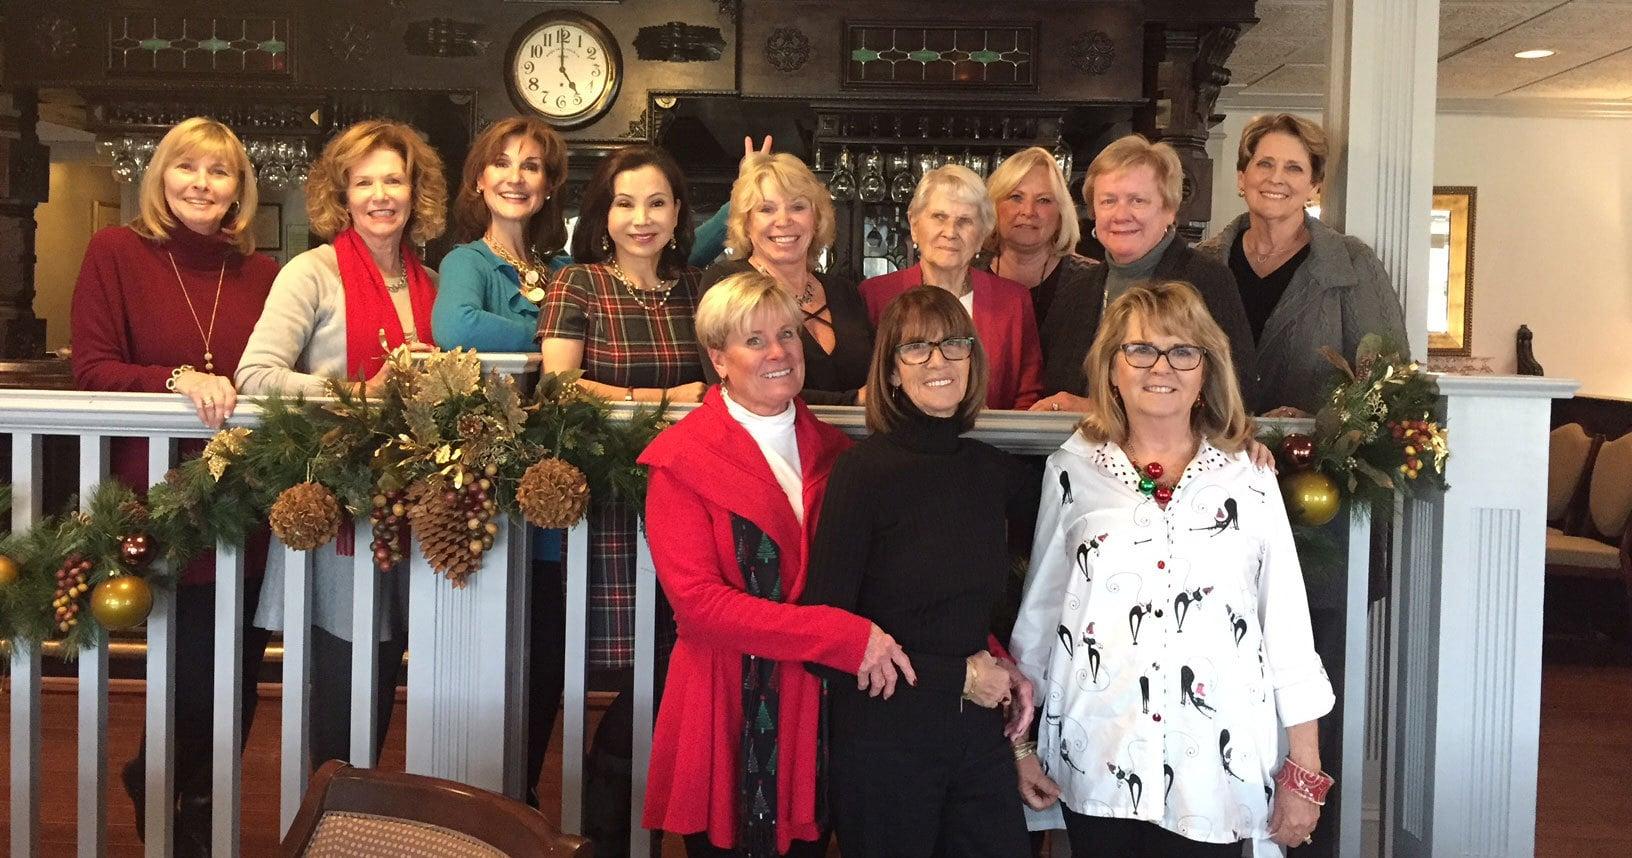 Karen's book club